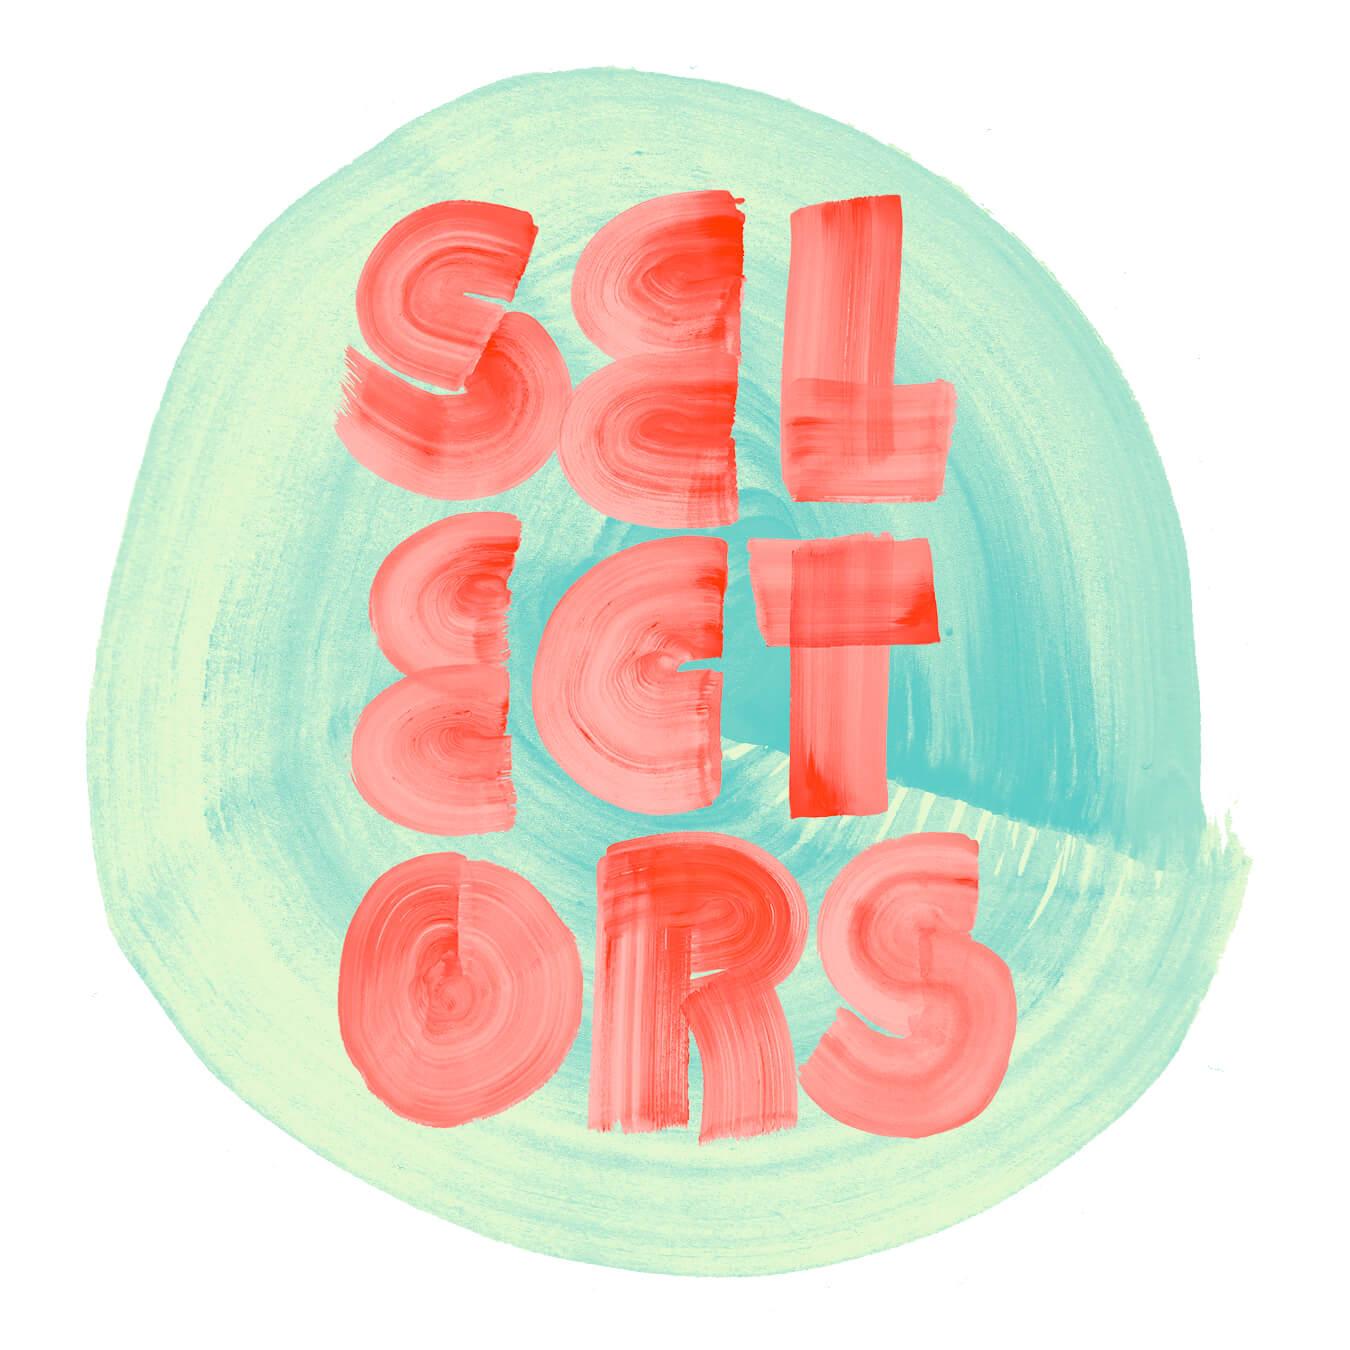 Dekmantel Selectors 2019